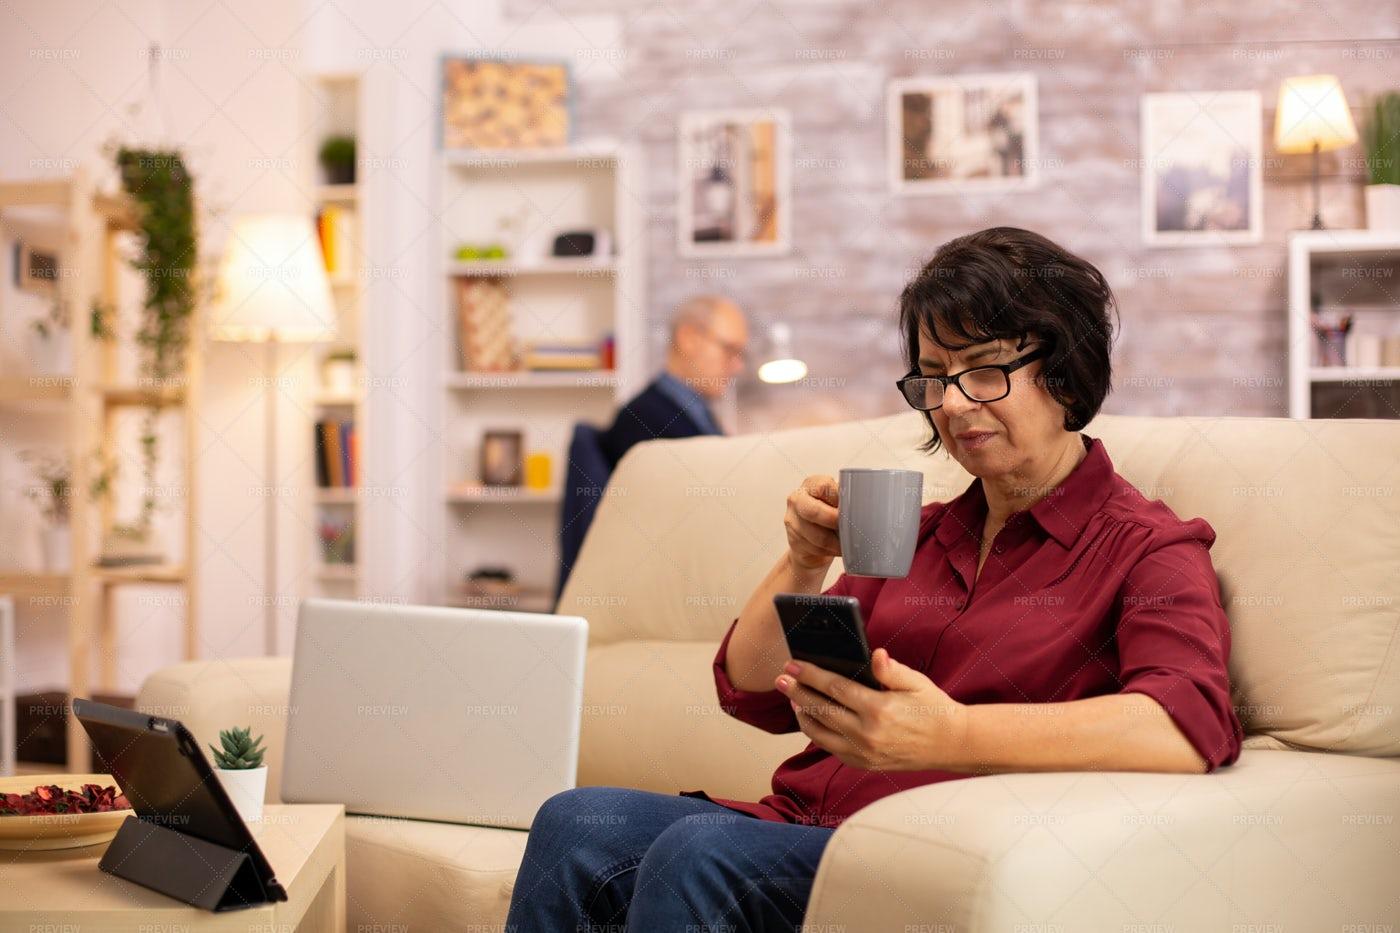 Elderly Lady Using Modern Technology: Stock Photos